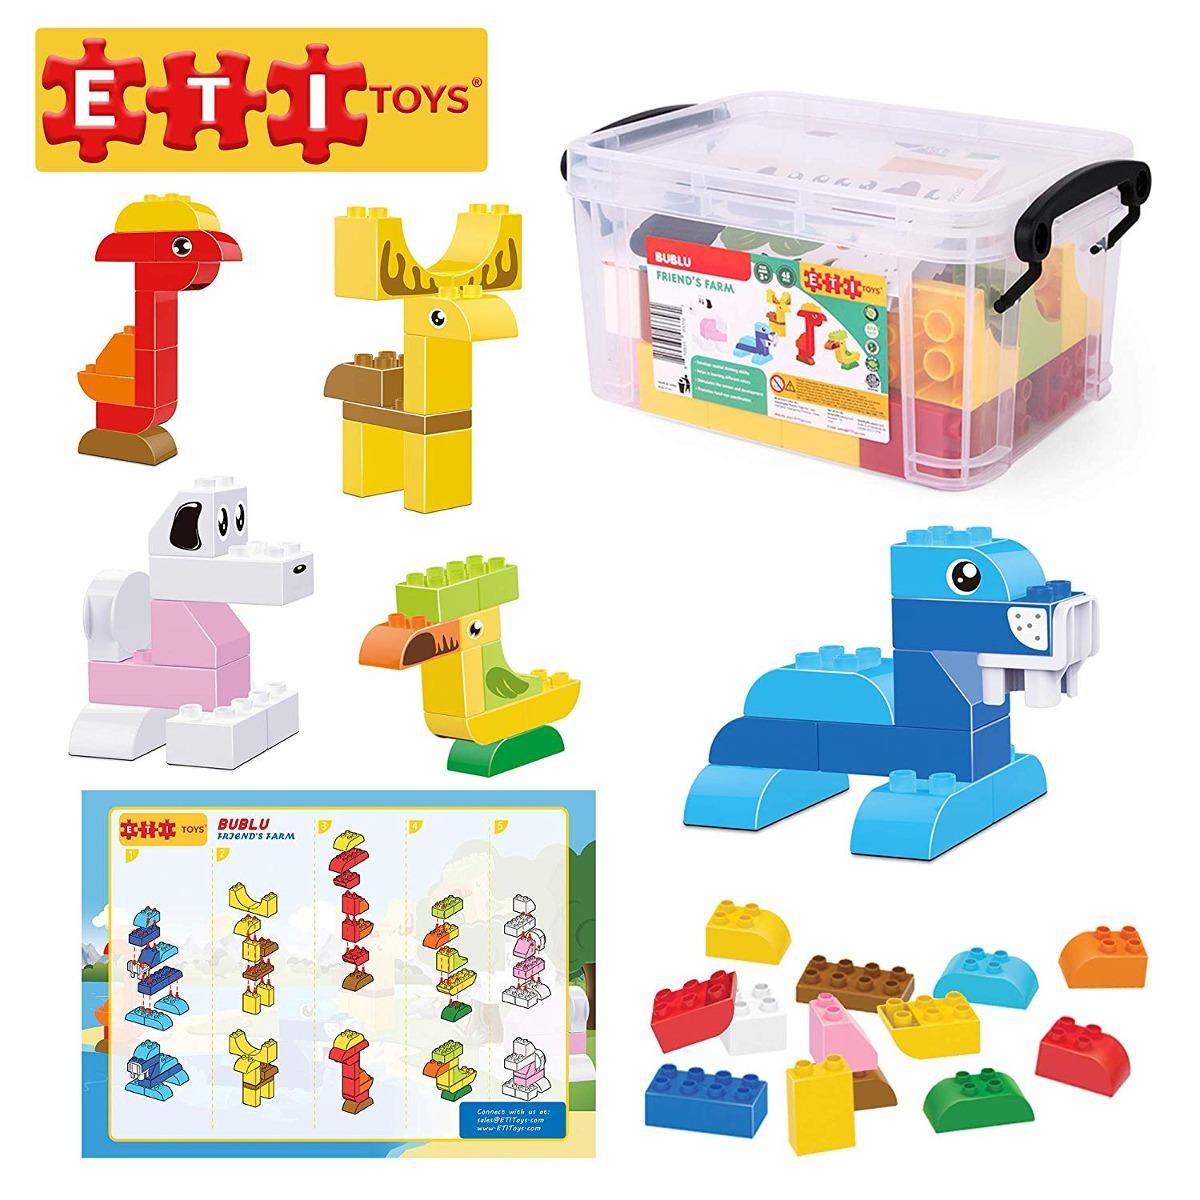 ETI Toys